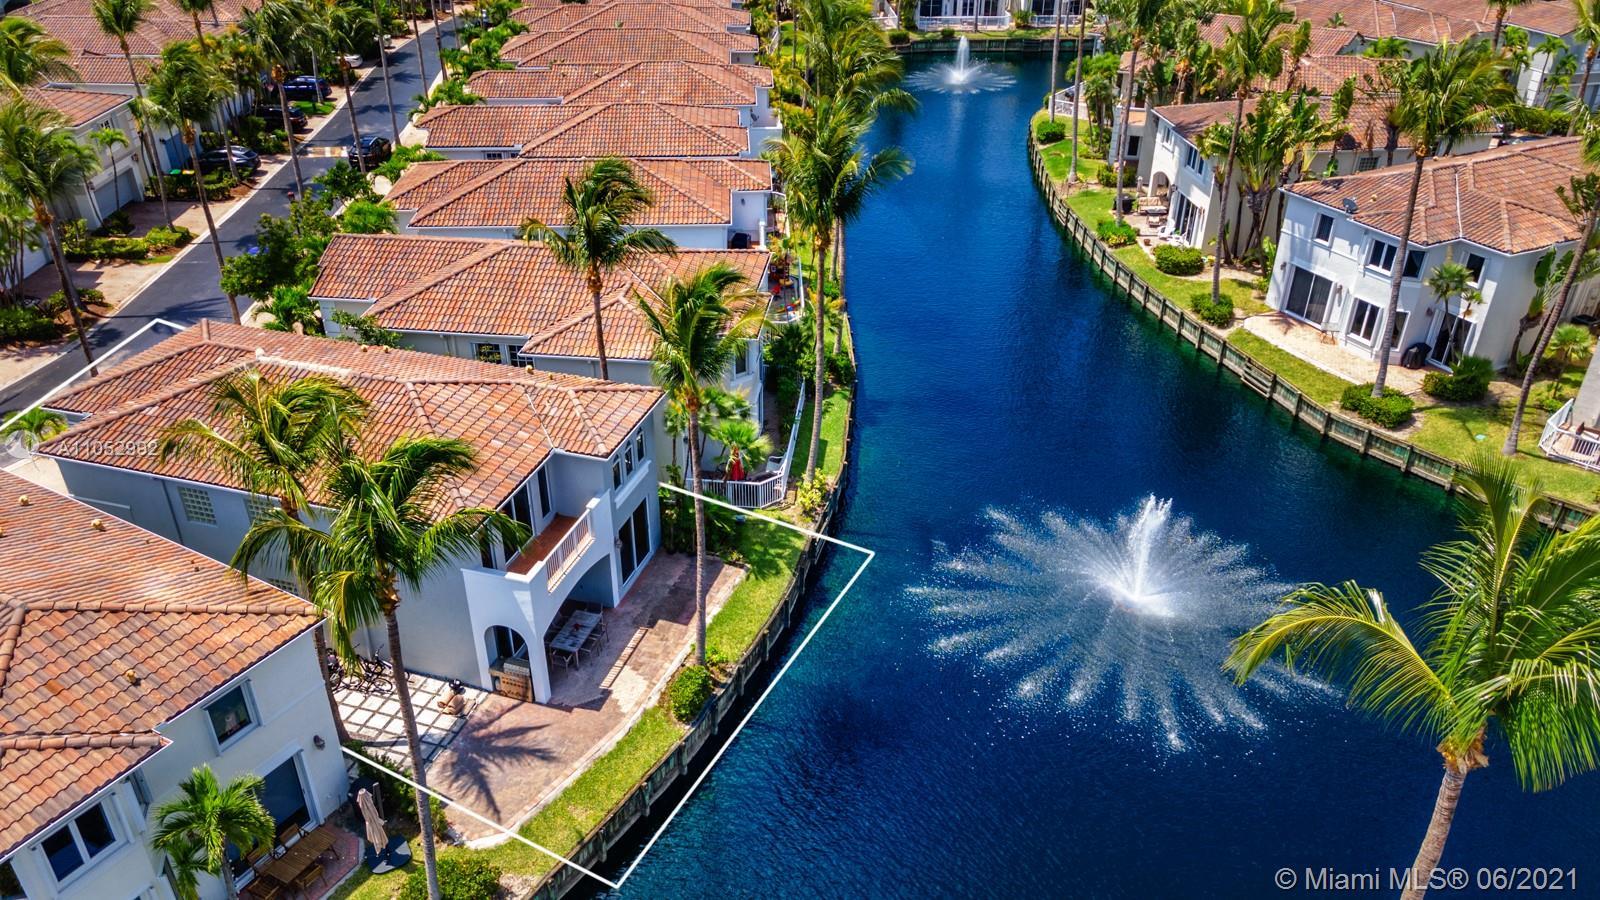 Photo of 20824 30TH PL, Aventura, Florida, 33180 -